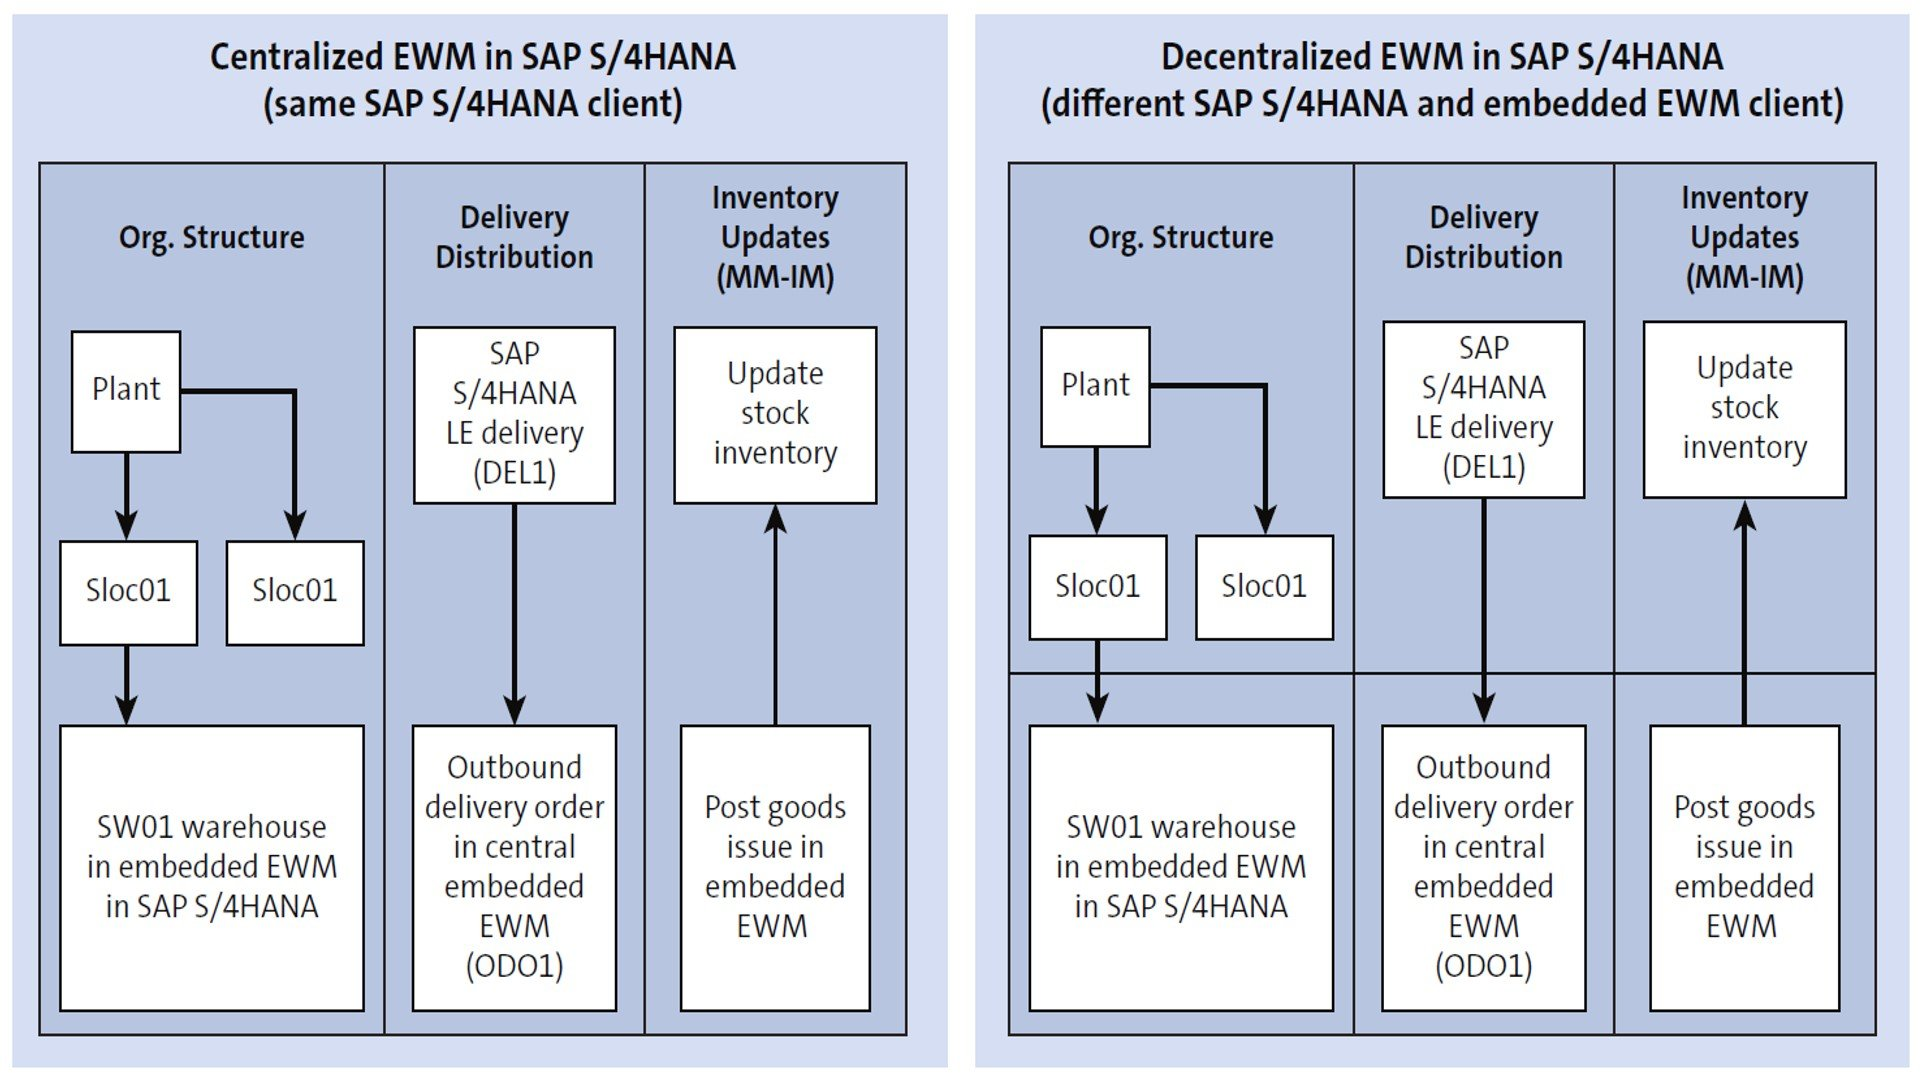 Centralized vs. Decentralized SAP EWM